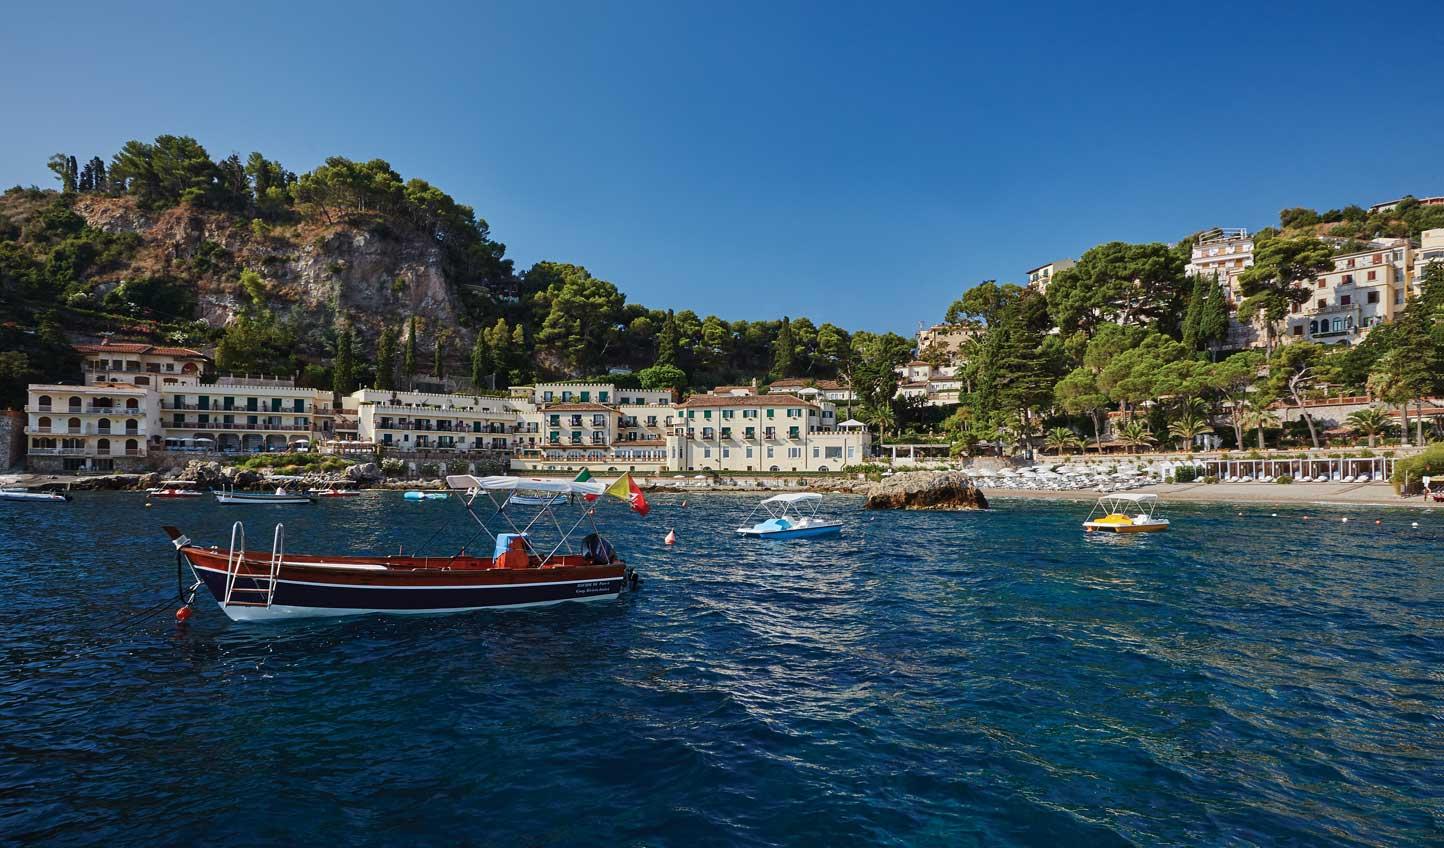 Sail away into Sicilia